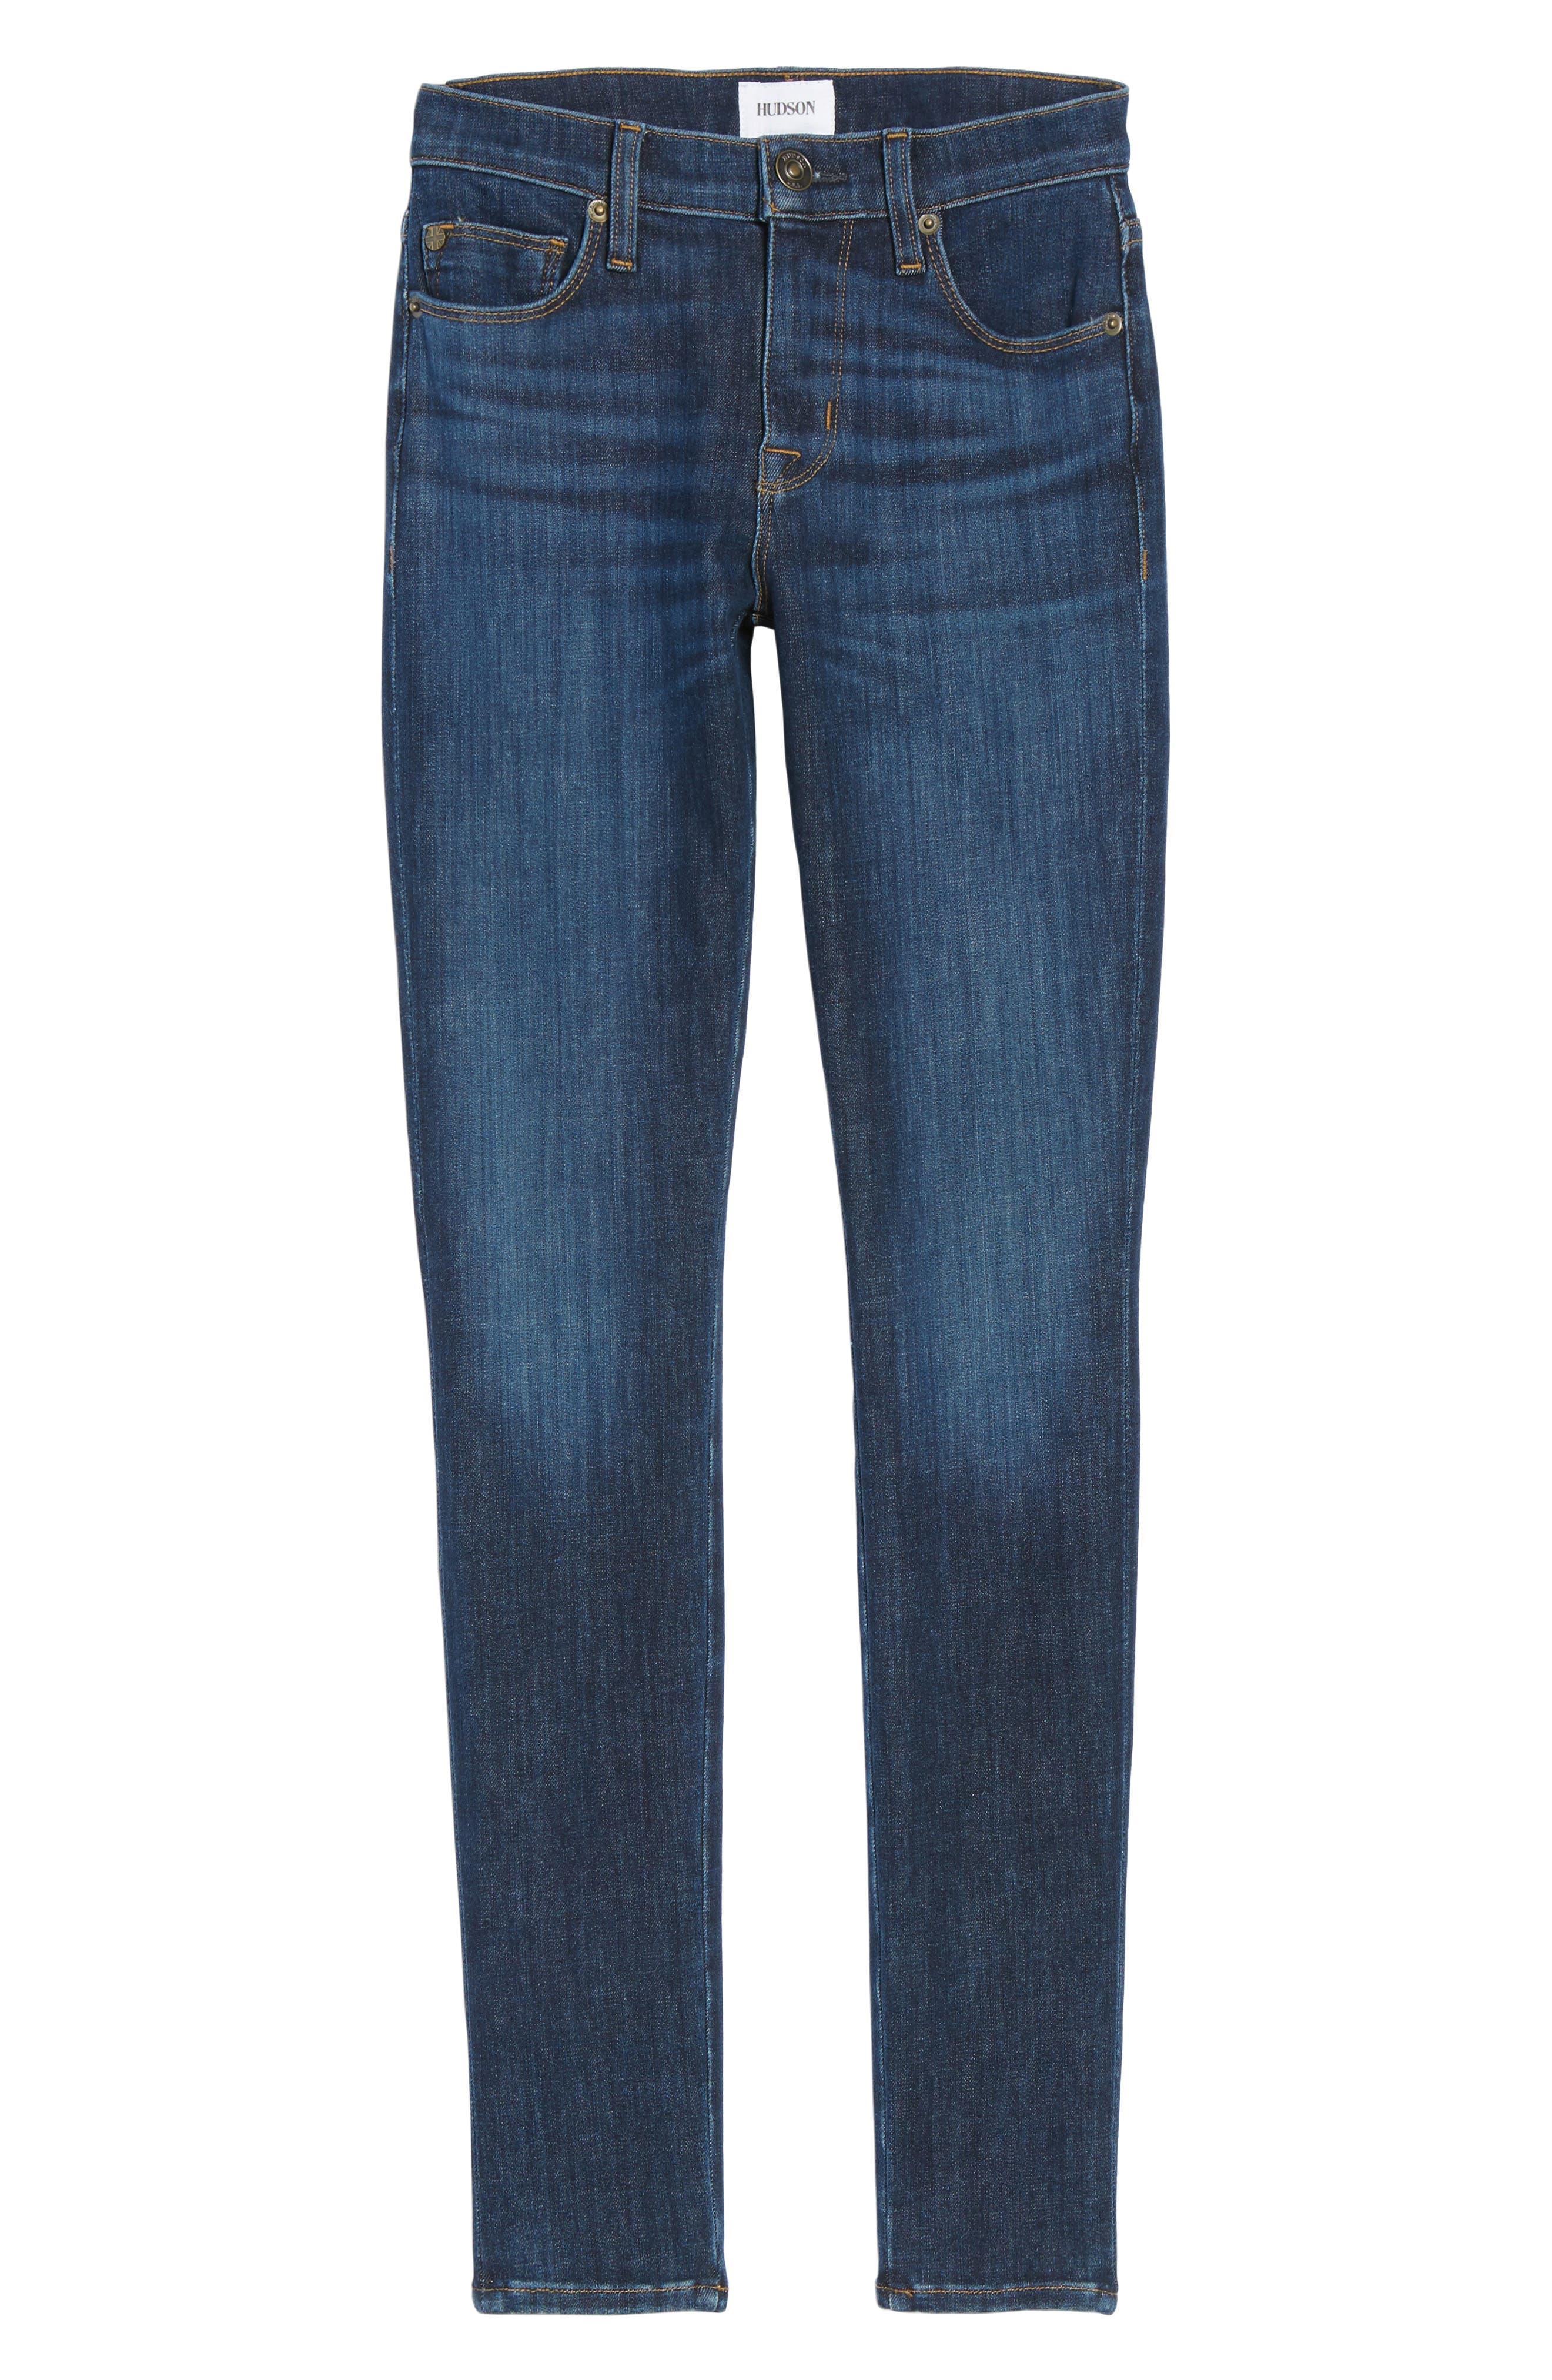 Nico Super Skinny Jeans,                             Alternate thumbnail 18, color,